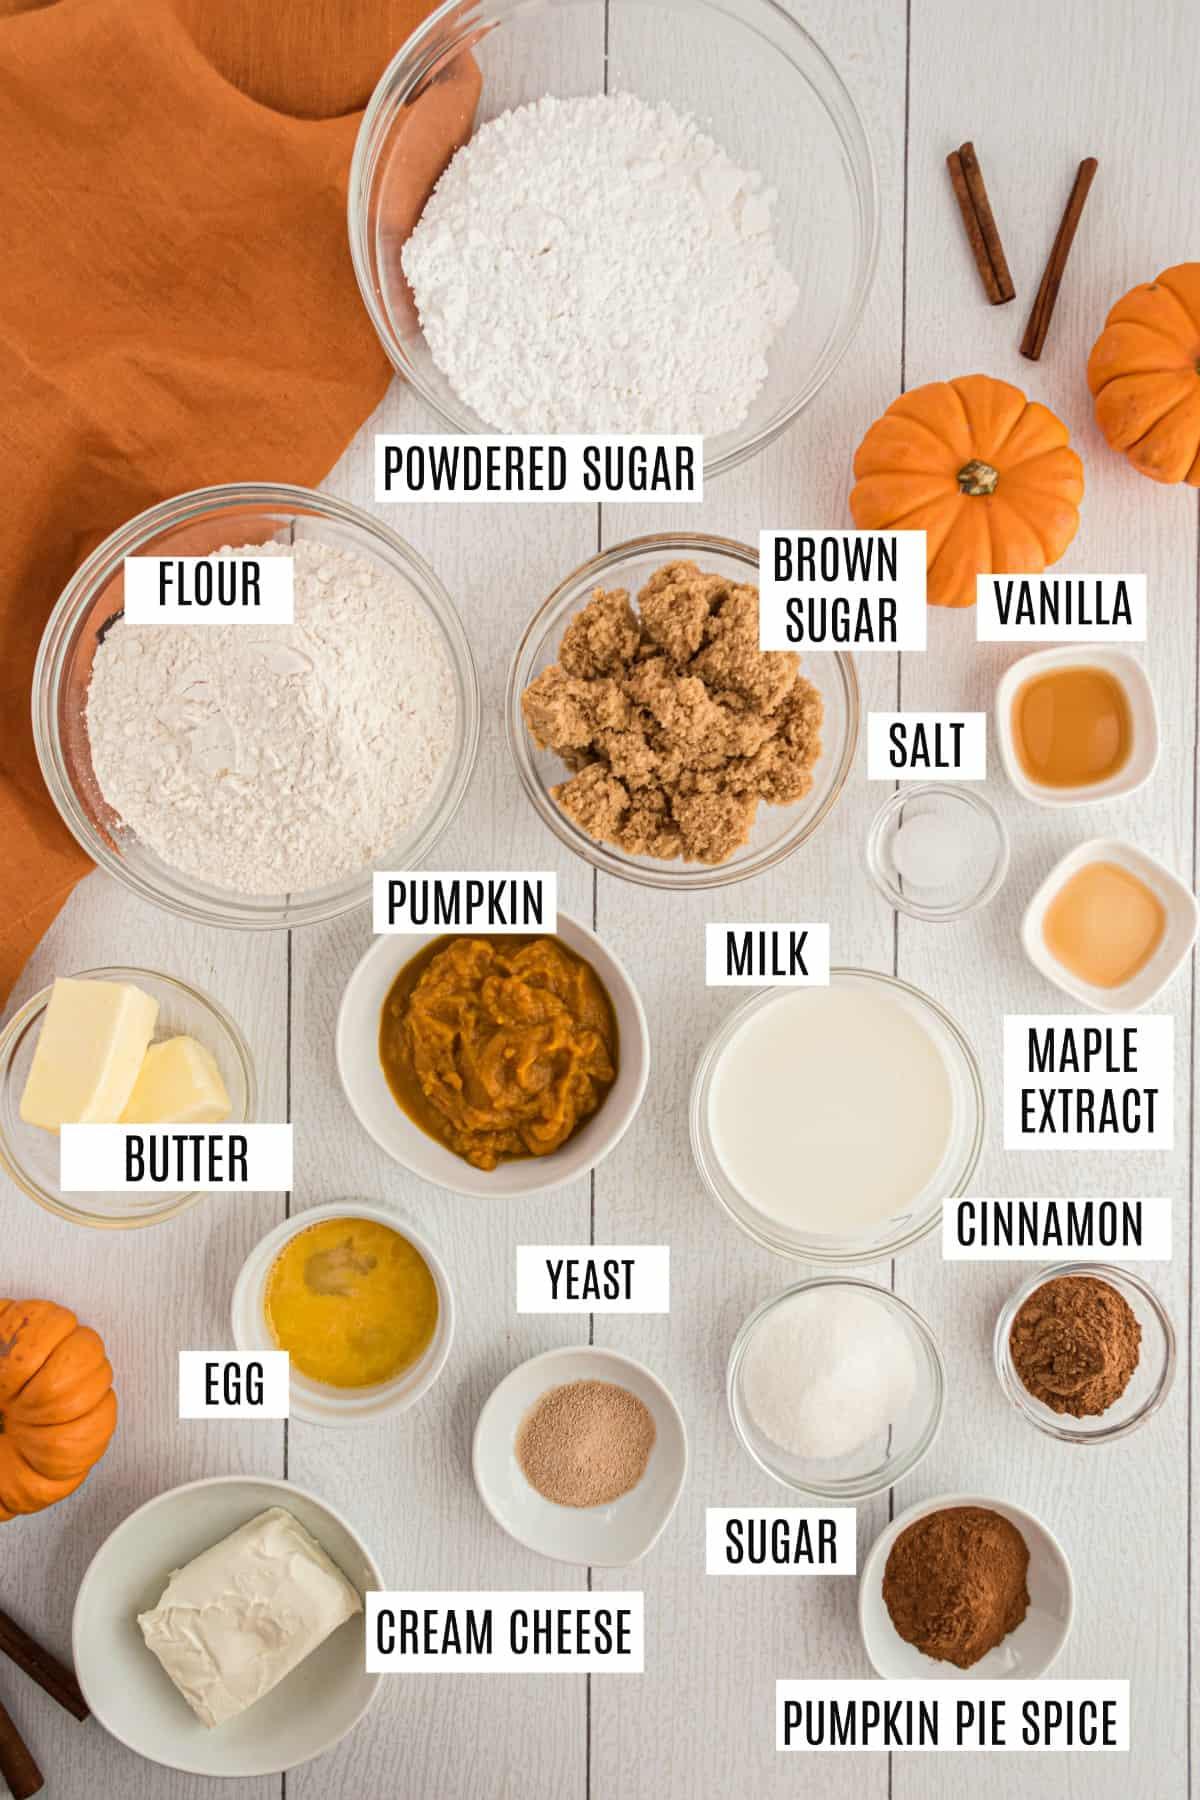 Ingredients needed to make pumpkin cinnamon rolls including yeast, pumpkin puree, and cinnamon.